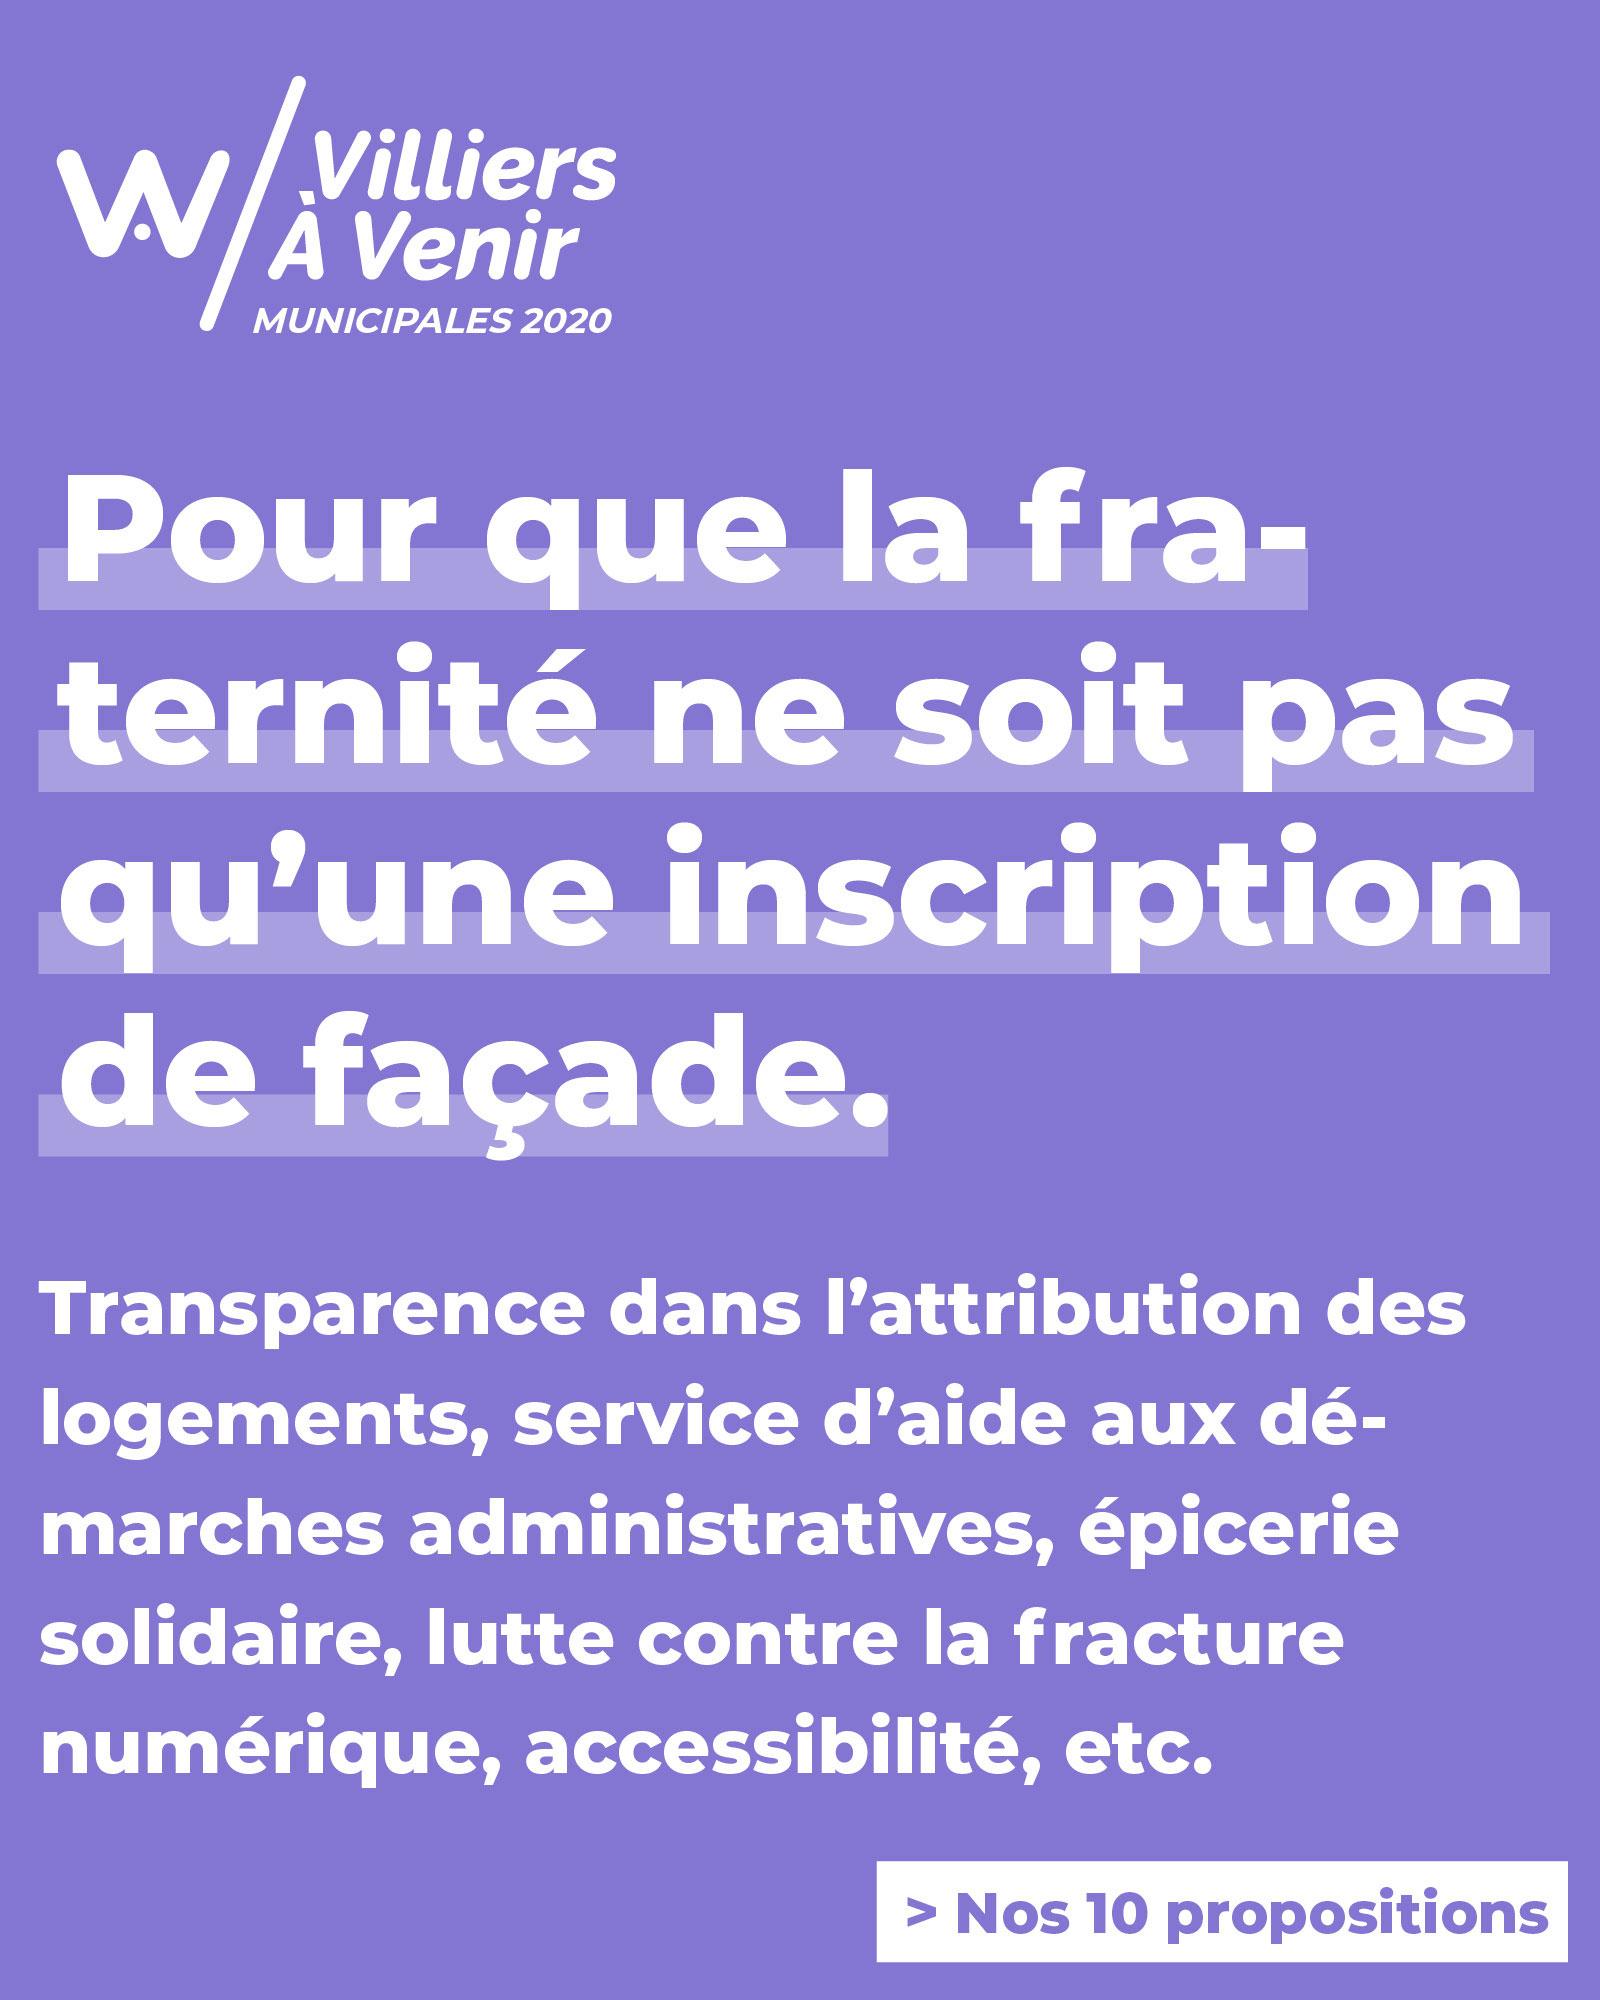 http://vav94.fr/wp-content/uploads/2020/02/SOLIDARITE-FRATERNITE-MUNICIPALES-2020-VILLIERS-SUR-MARNE-VILLIERS-A-VENIR-2.jpg